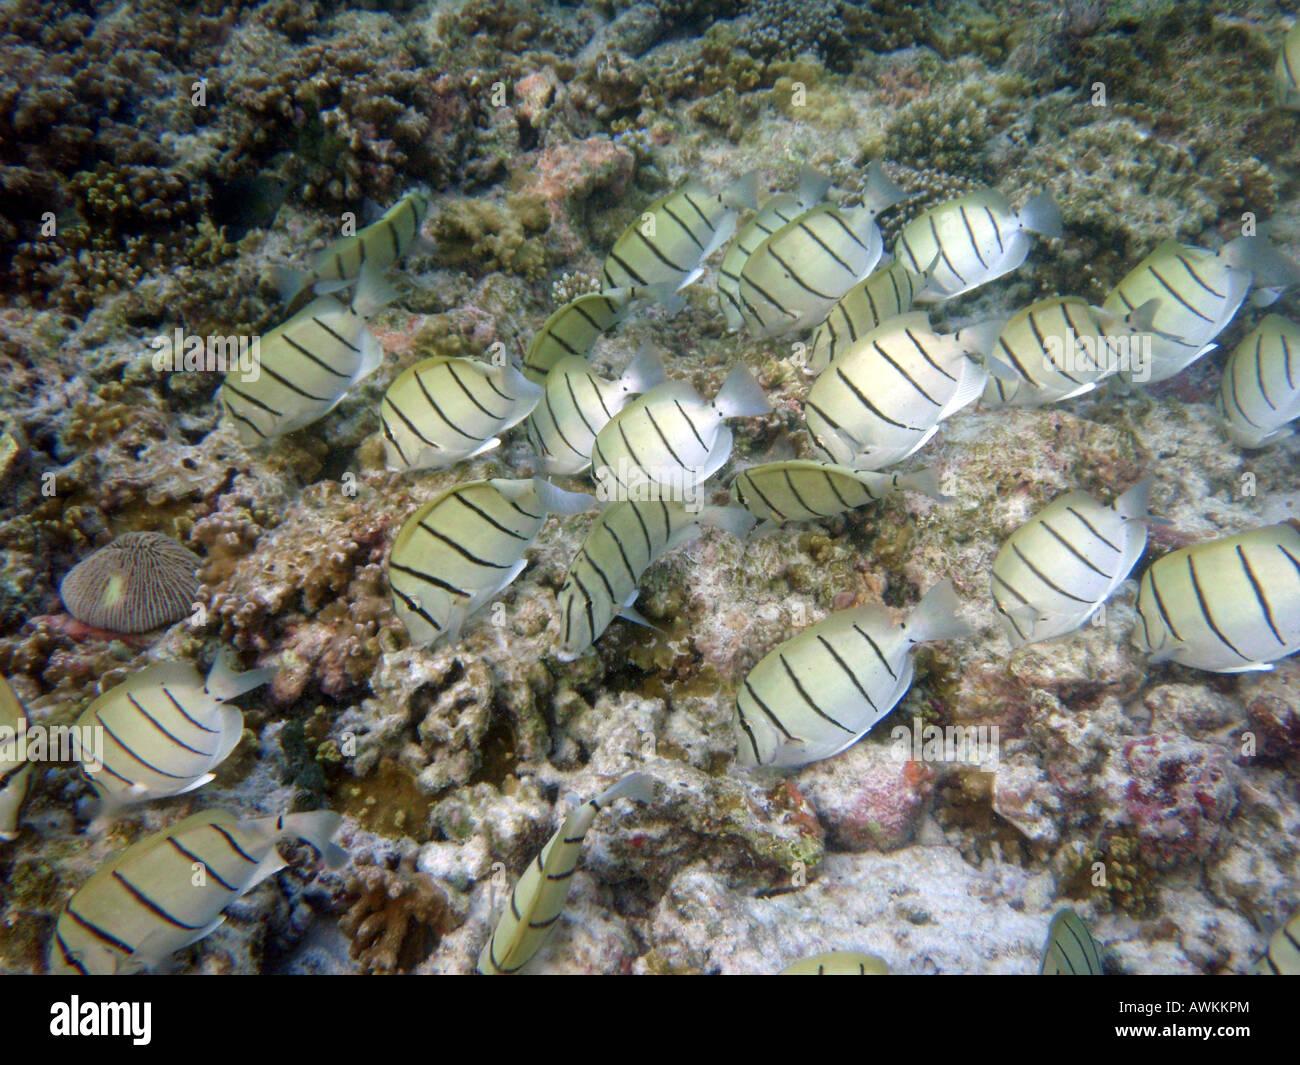 Convict Surgeonfish (Convict Tang)  [Bandos Island Reef, Kaafu Atoll, Maldives, Asia]                           Stock Photo